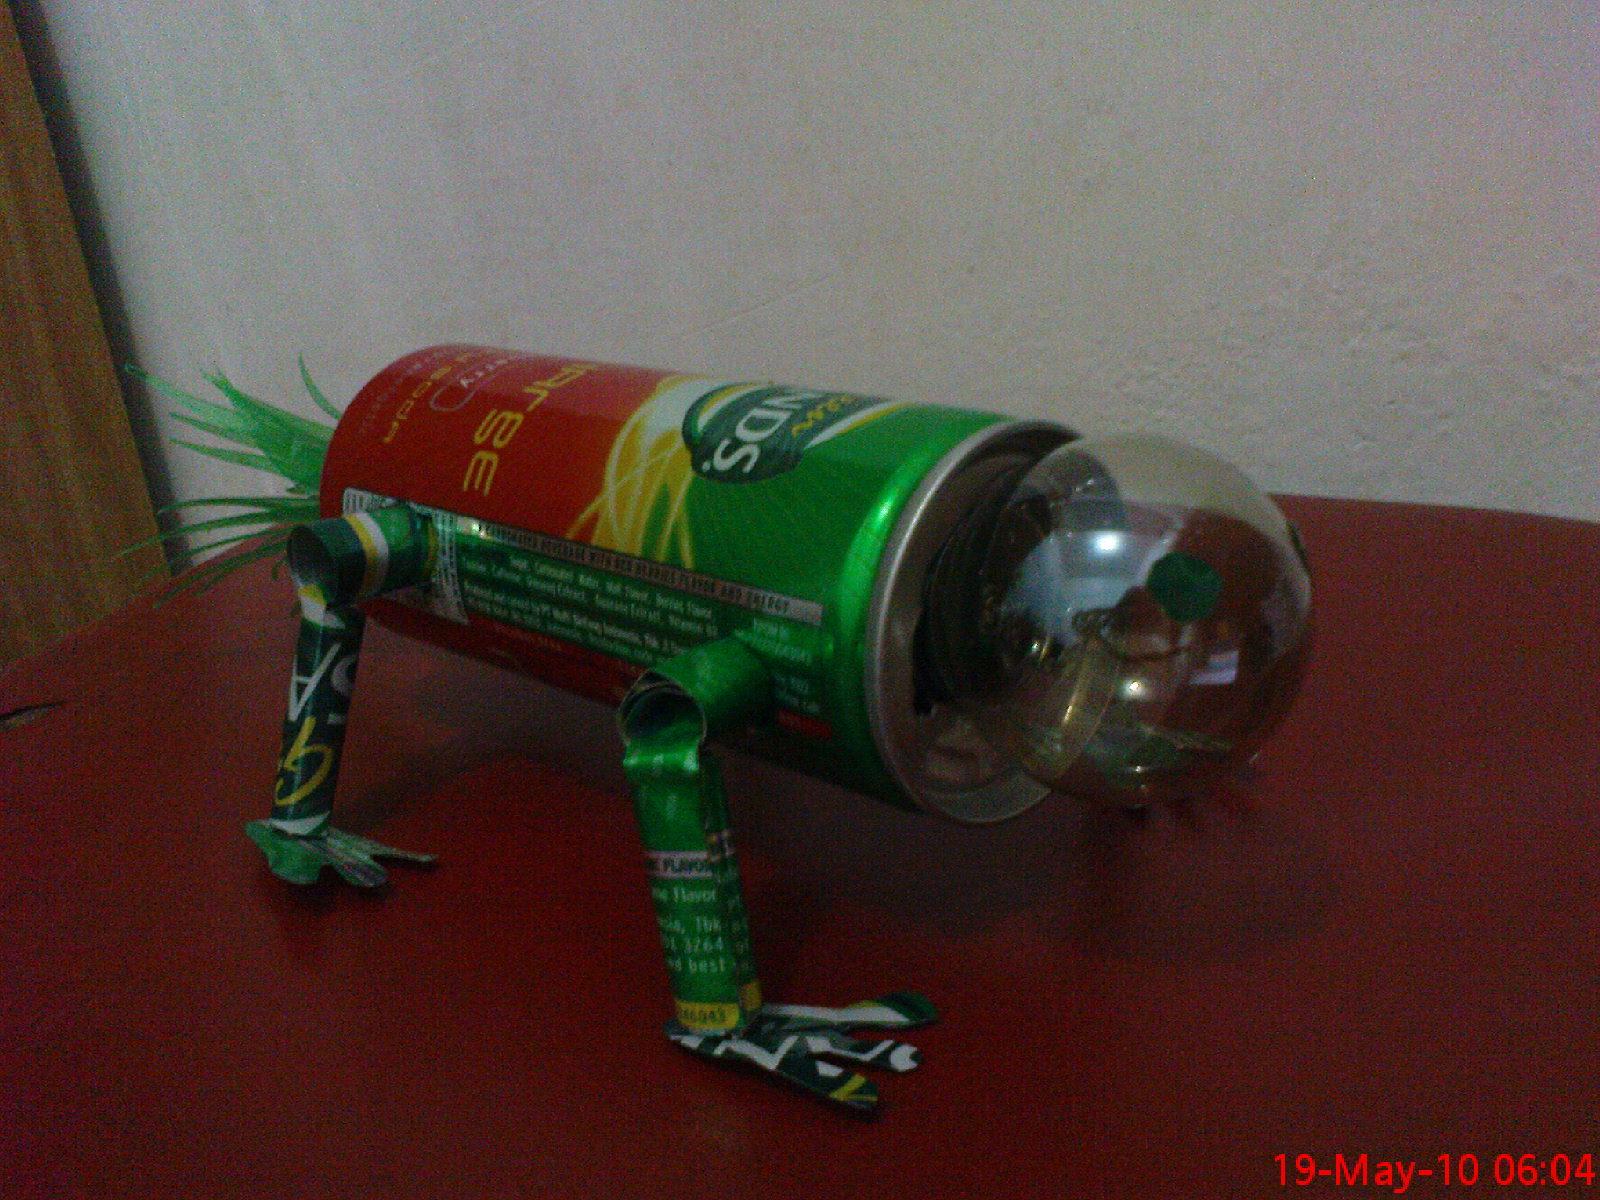 terbuat dari lampu bekas yang direkatkan pada kaset CD yang juga bekas